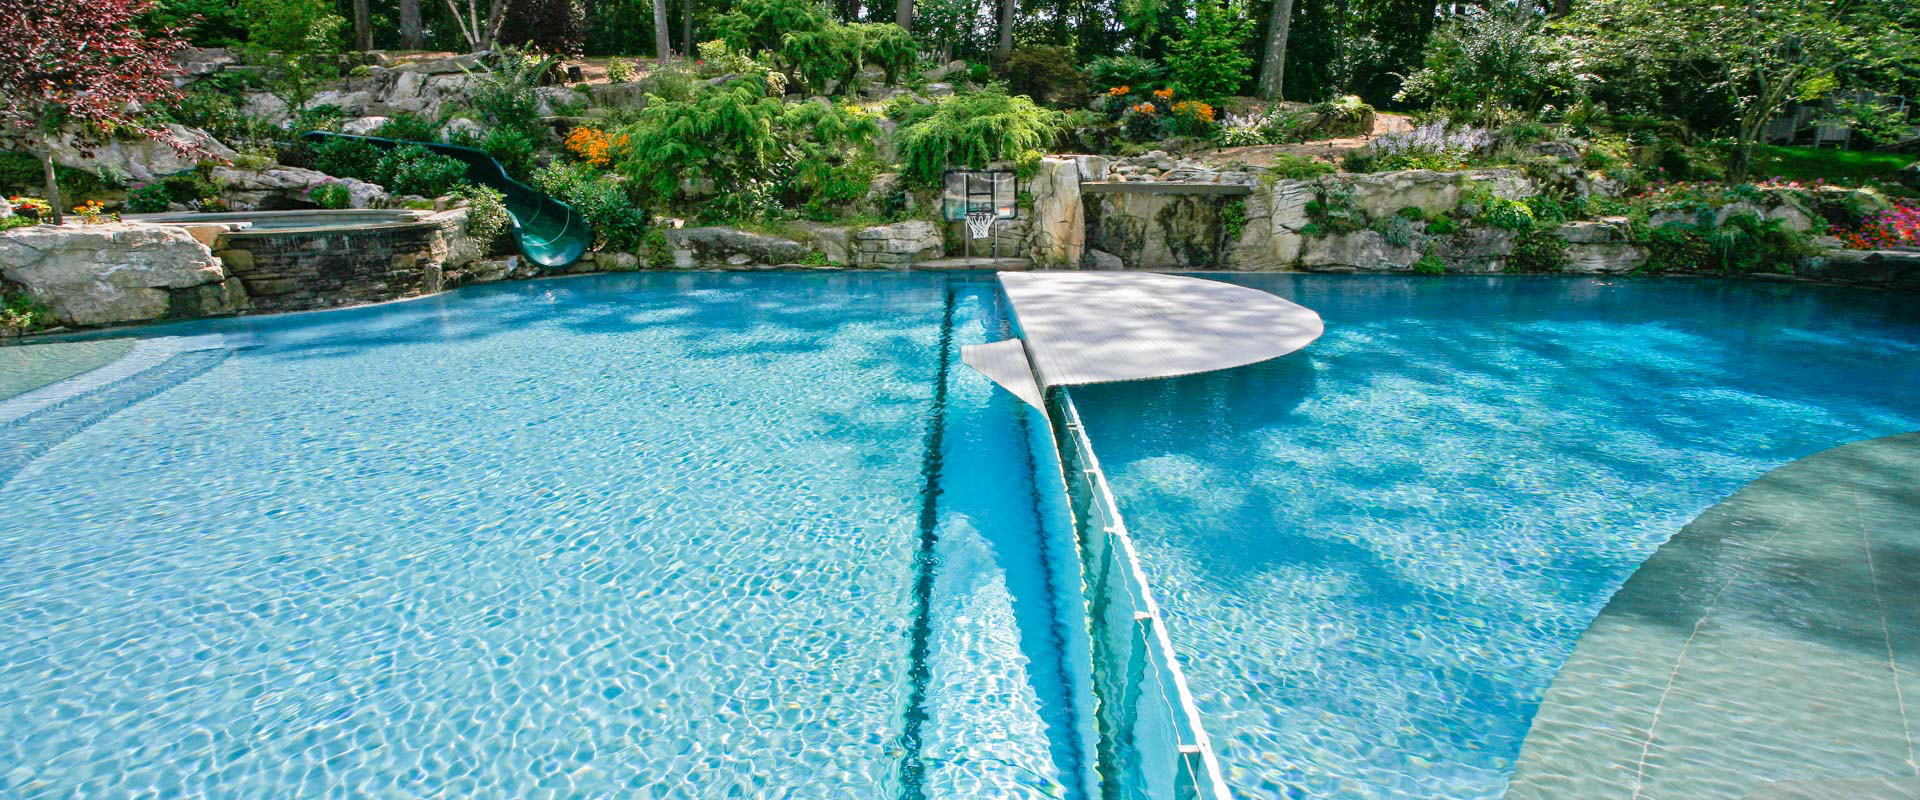 Automatic rigid pool cover system - type IBS-8 - grando GmbH ...